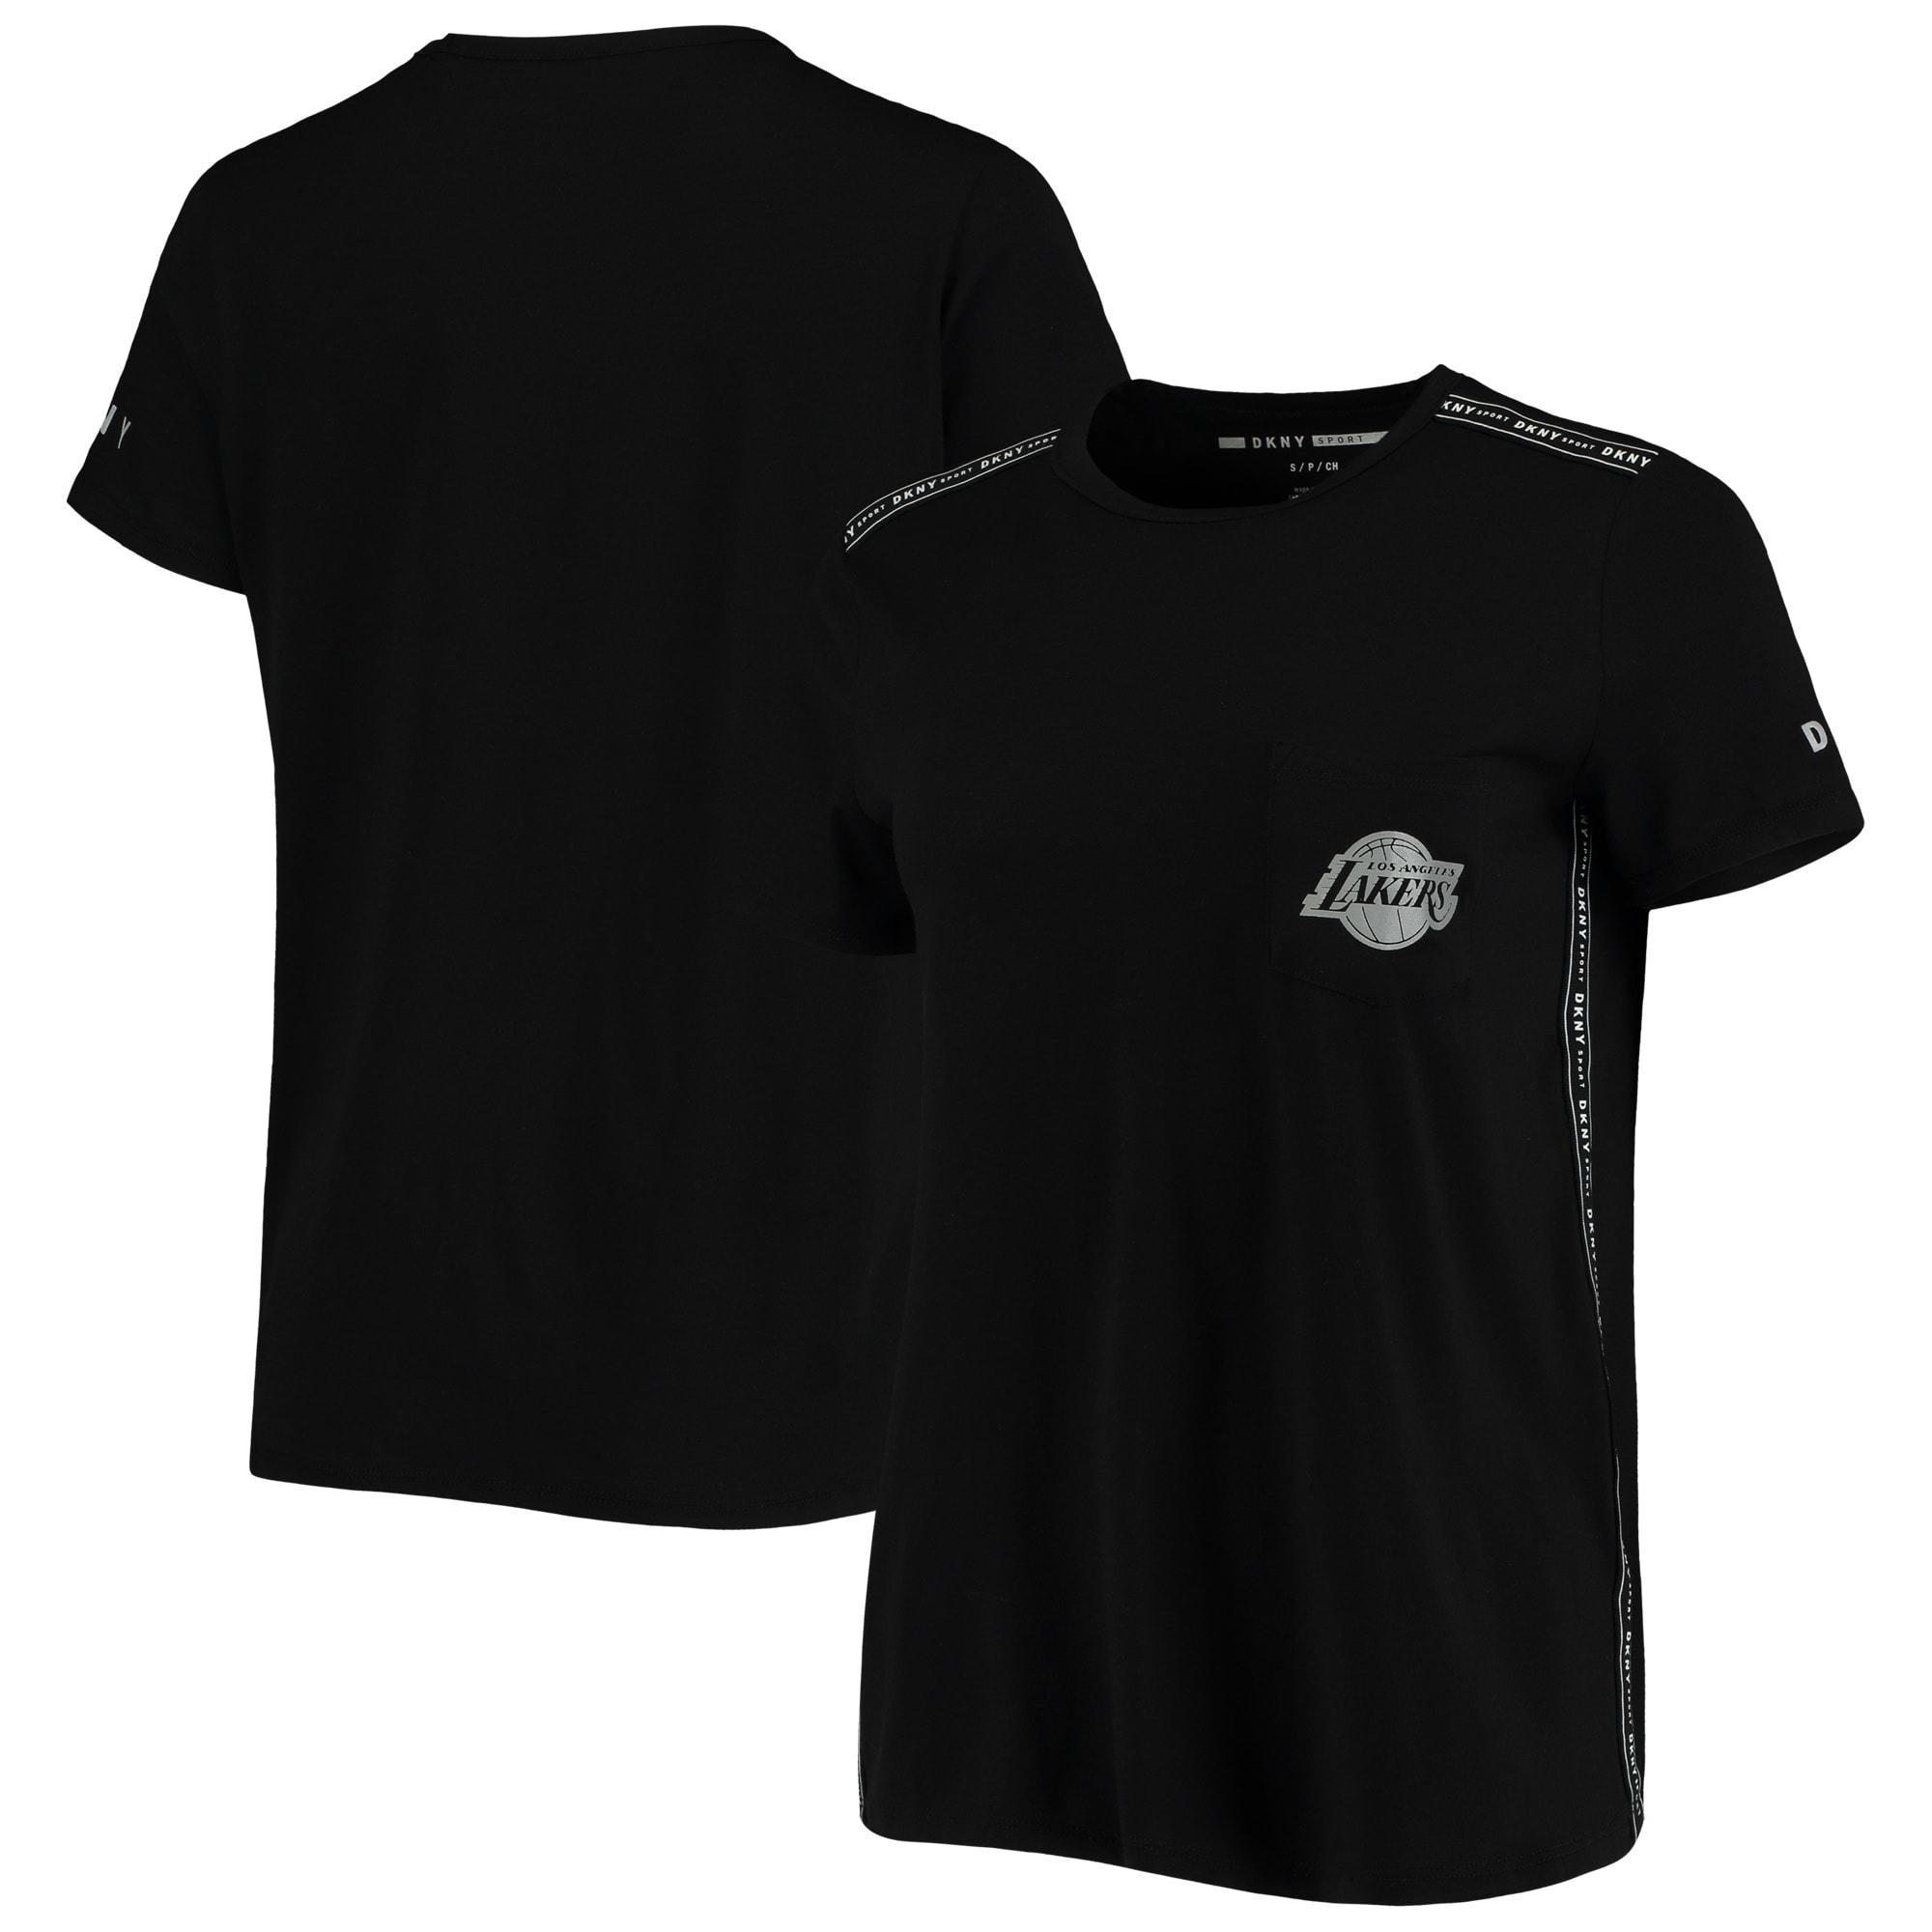 Los Angeles Lakers DKNY Sport Women's Donna Sport Pocket Tri-Blend T-Shirt - Black